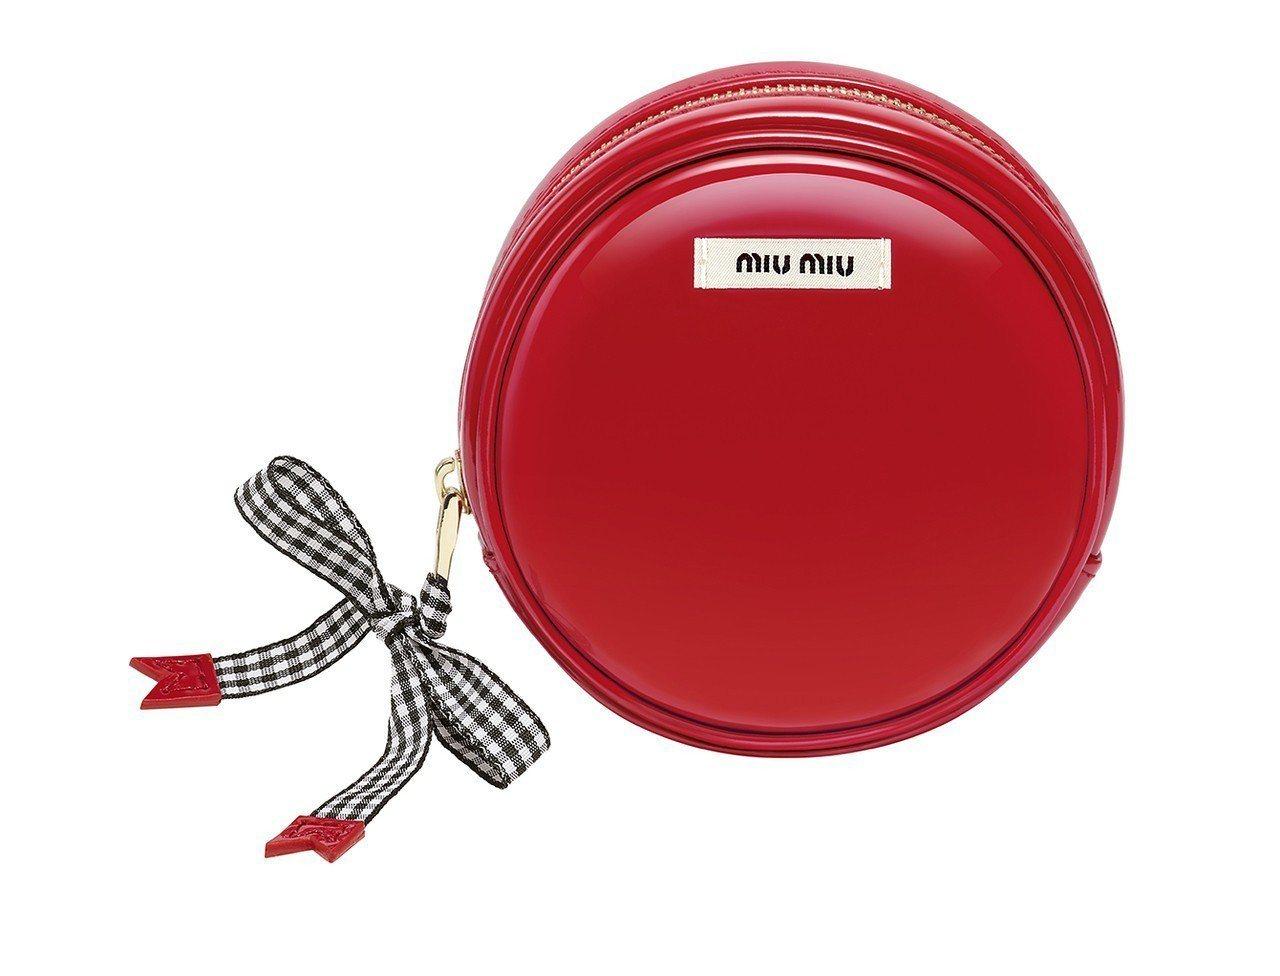 miu miu復古漆皮圓形化妝包是盧亞香水新光三越台南店、漢神百貨B1科蒂精品的...